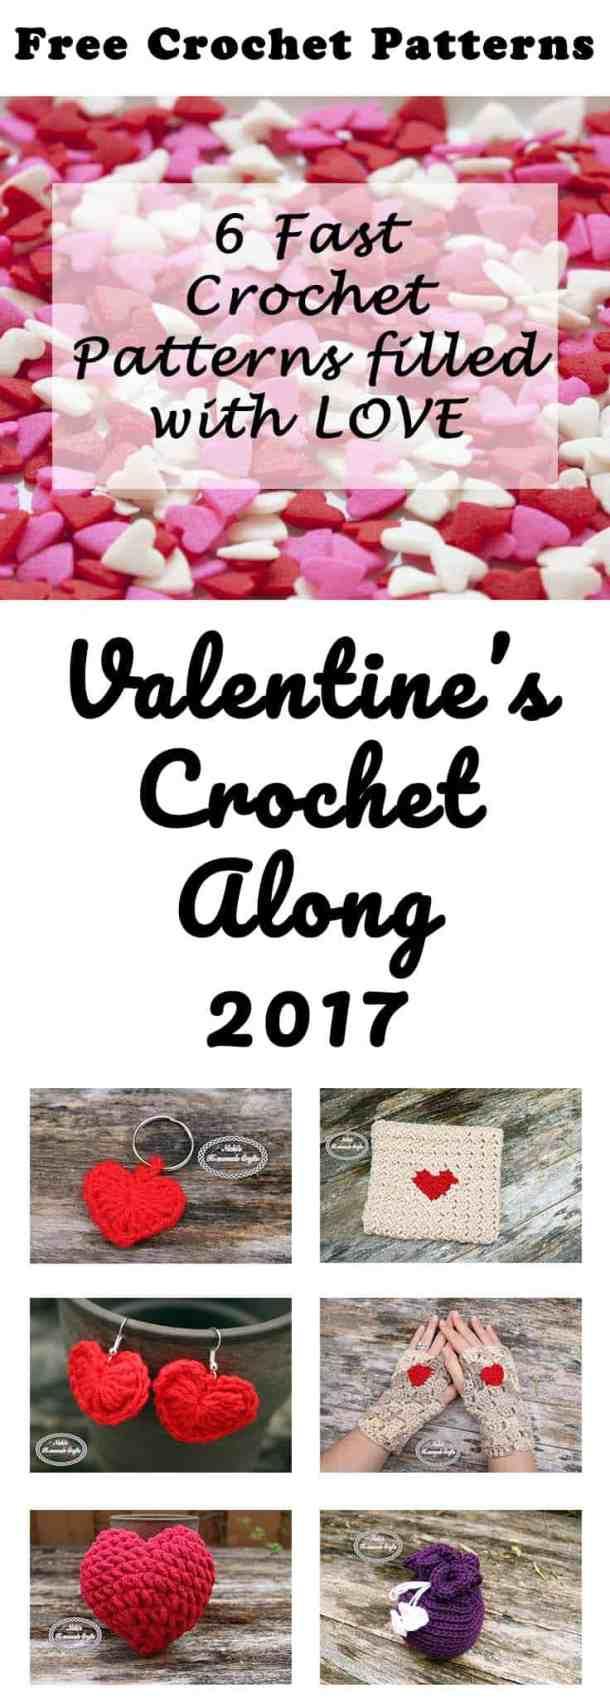 Valentine's CAL 2017 Free Crochet Patterns by Nicki's Homemade Crafts #crochet #crochetalong #freecrochetpatterns #heart #love #valentinesday